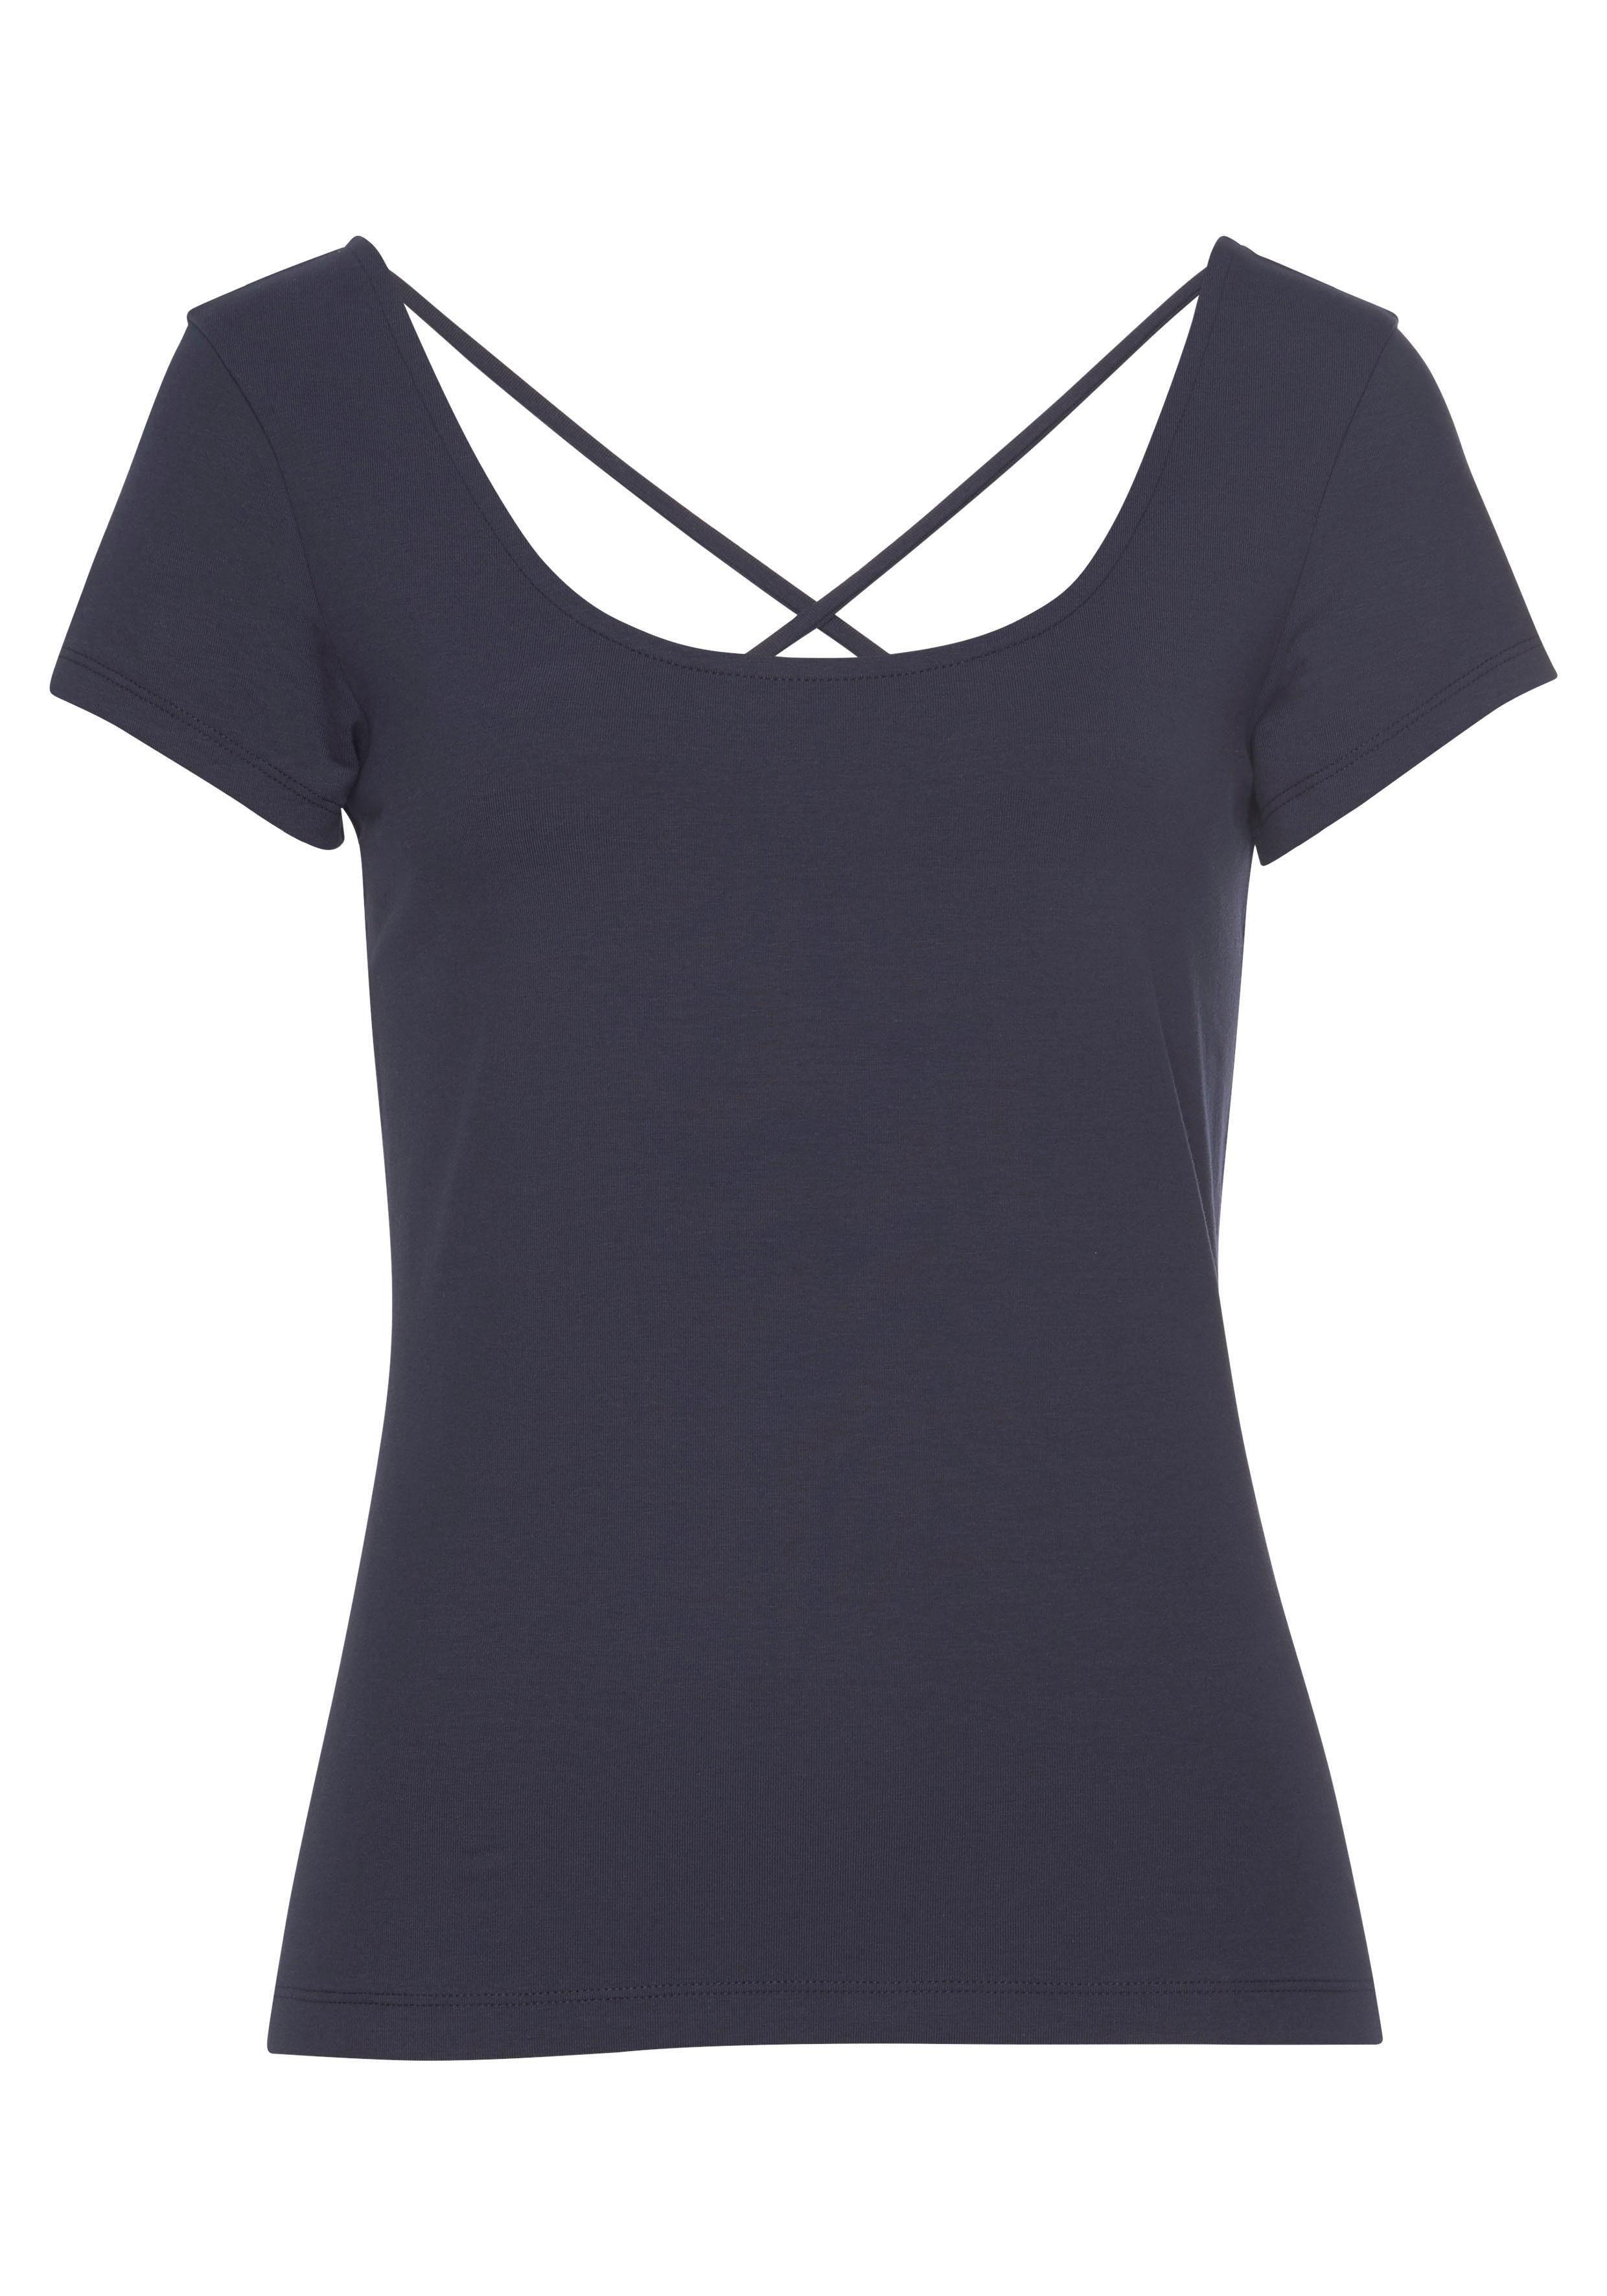 s.oliver beachwear - sOliver Beachwear Kurzarmshirt